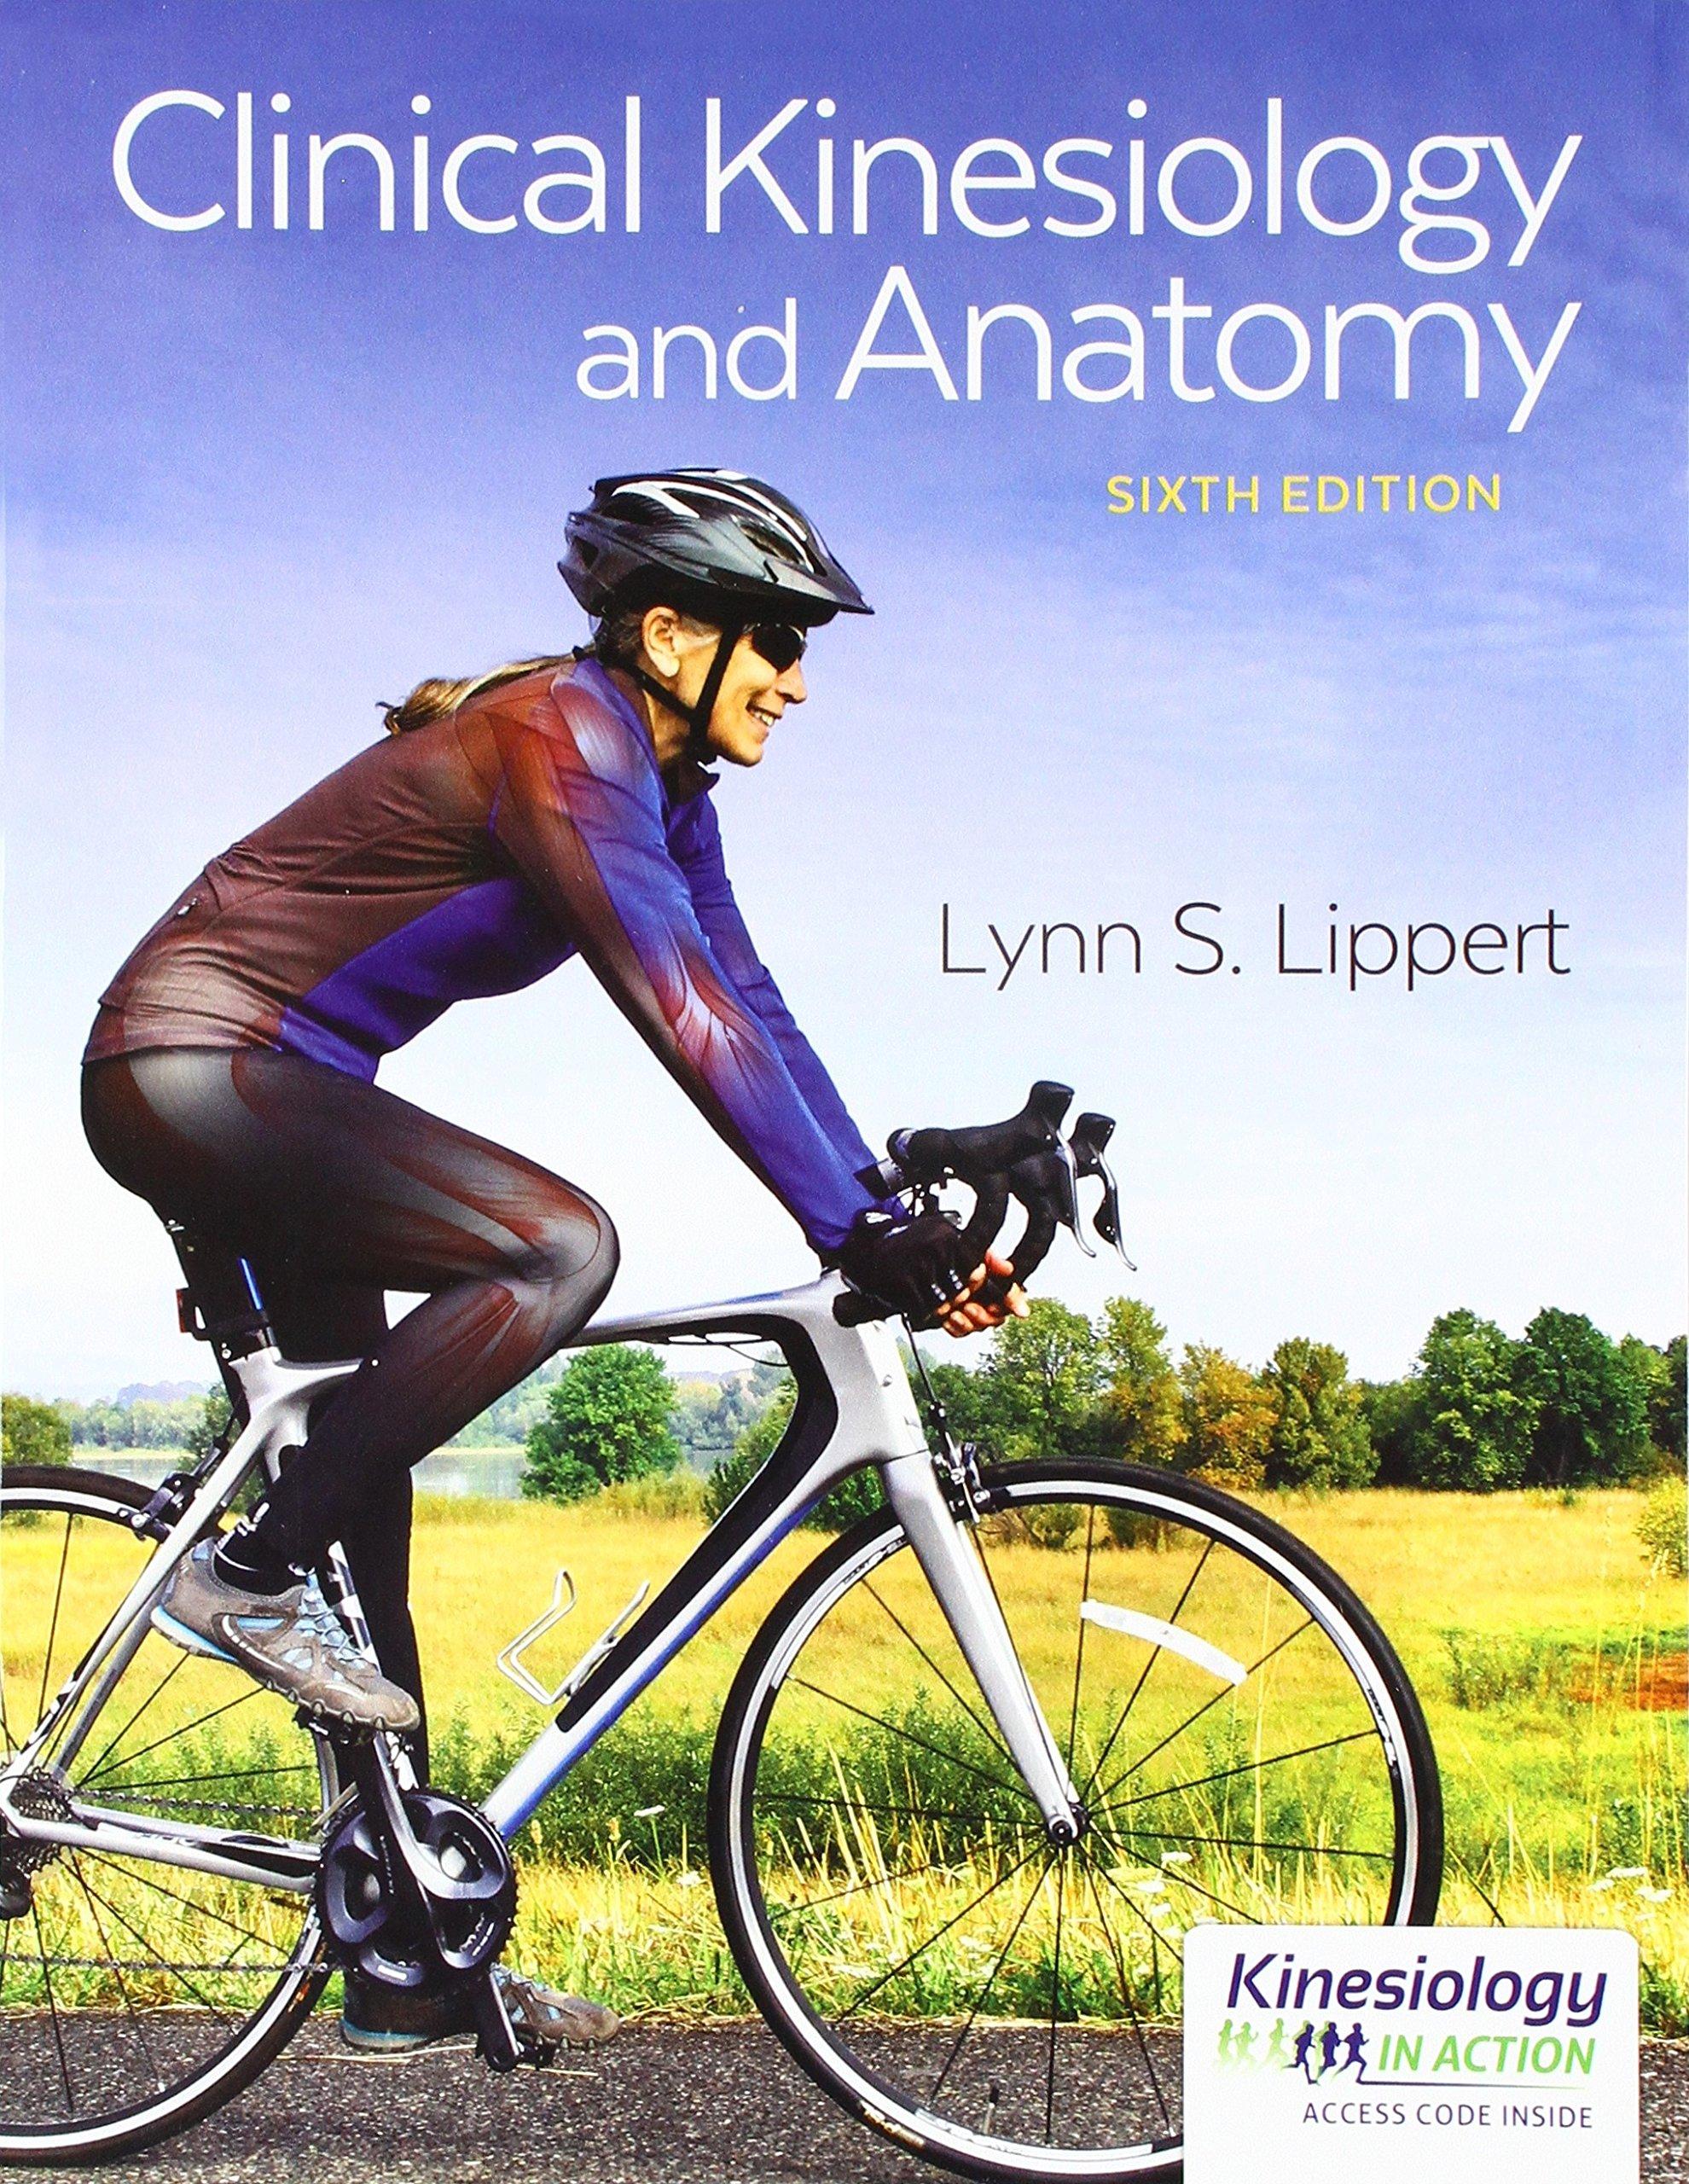 Pkg: Clin Kines & Anat 6e & Lab Manual for Clin Kines & Anat 4e & Kines Flash Cards 4e